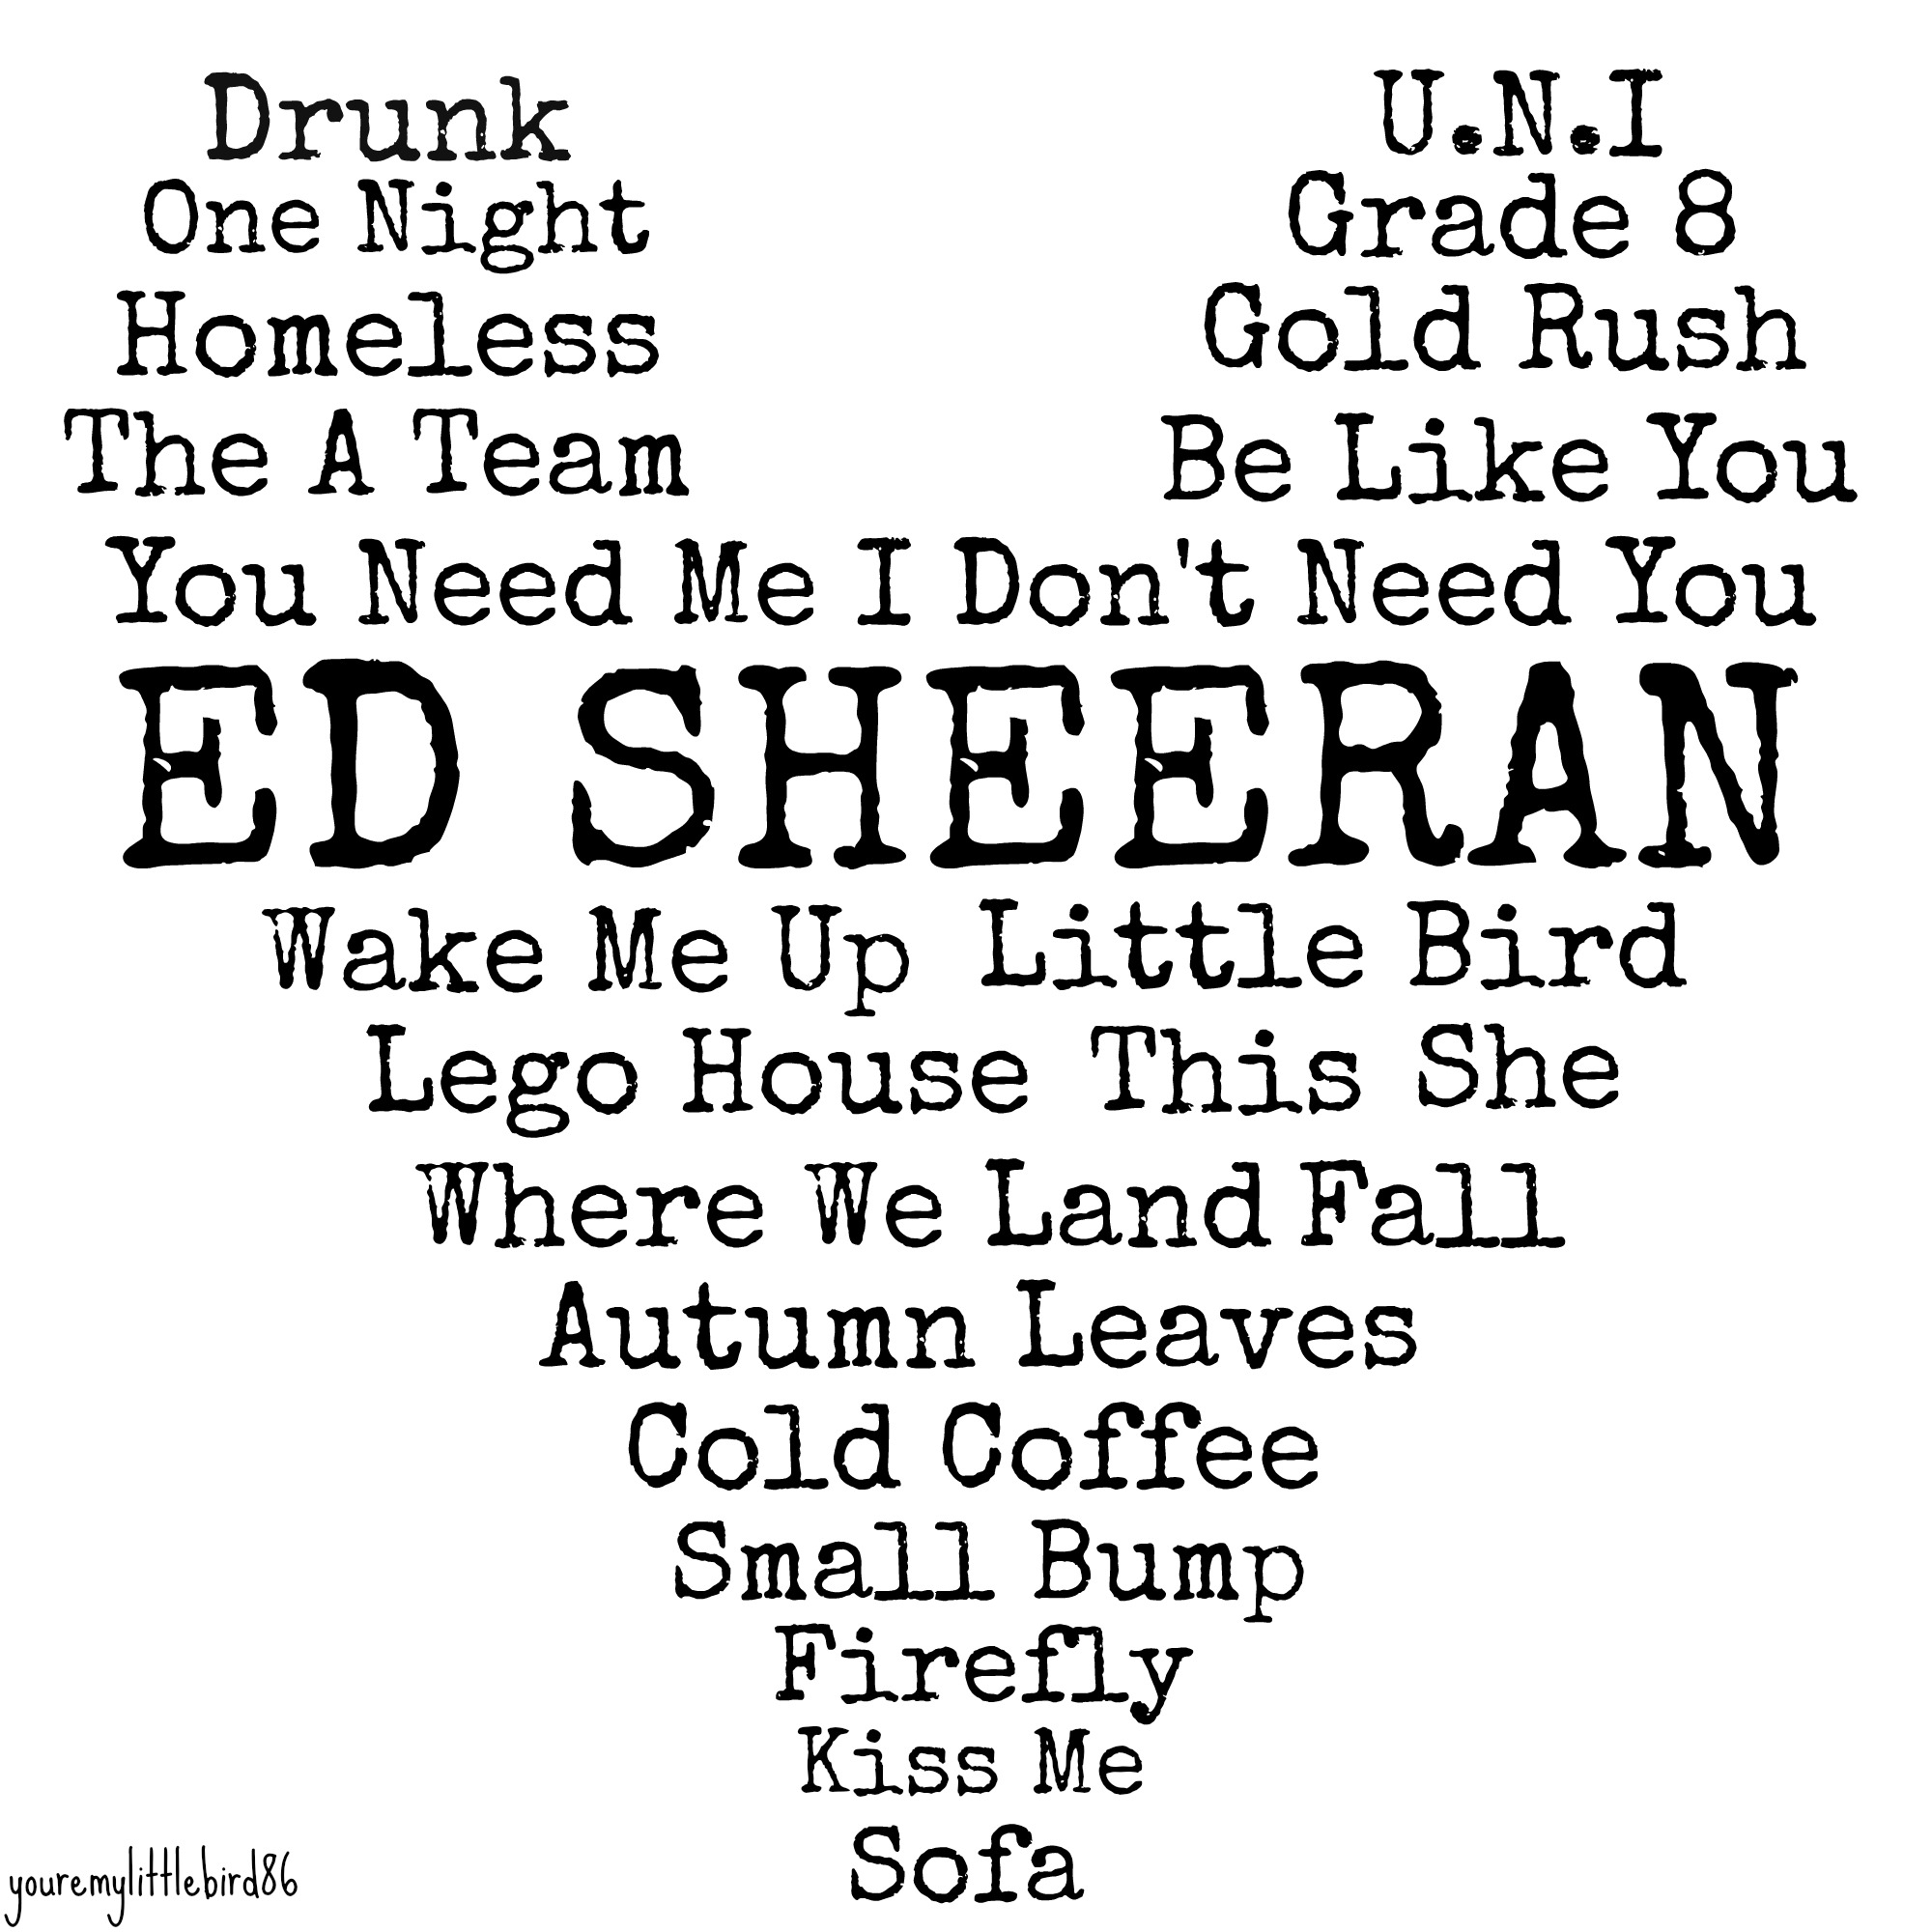 ed sheeran song lyrics drawings tumblr - photo #27